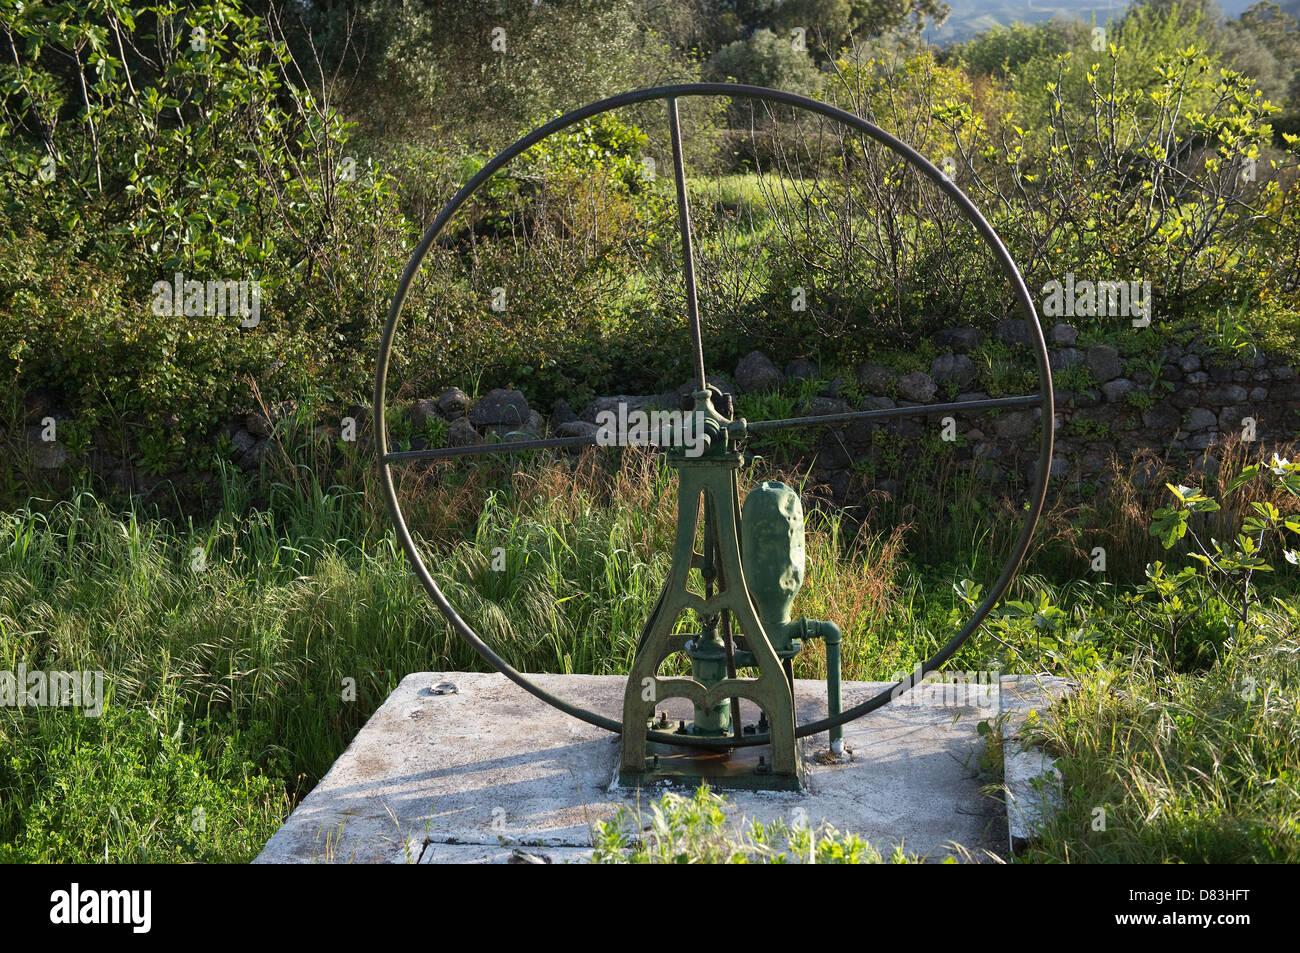 Old iron waterwheel Ferrobo village Sao Bras de Alportel Algarve Southern Portugal Mediterranean Europe - Stock Image